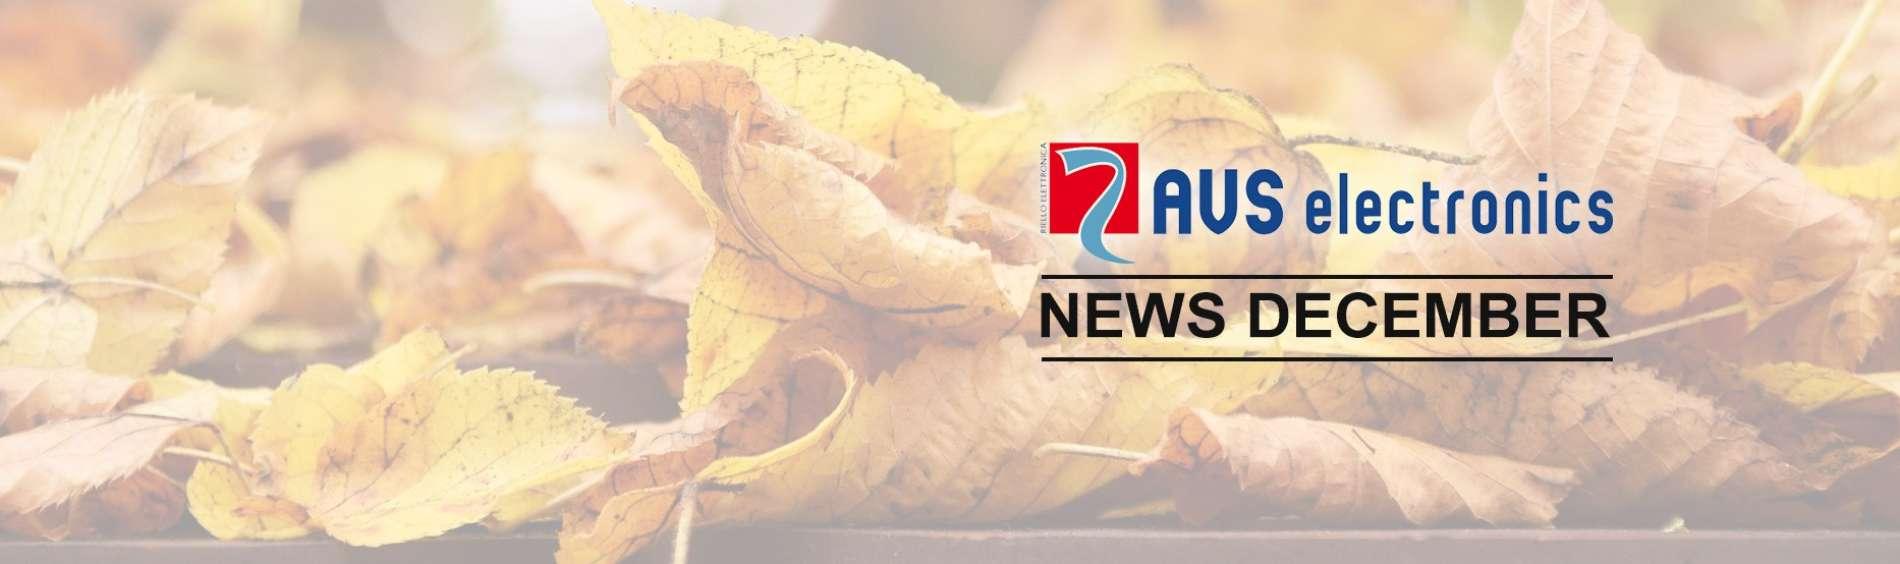 AVS Electronics <br> NEWS DECEMBER